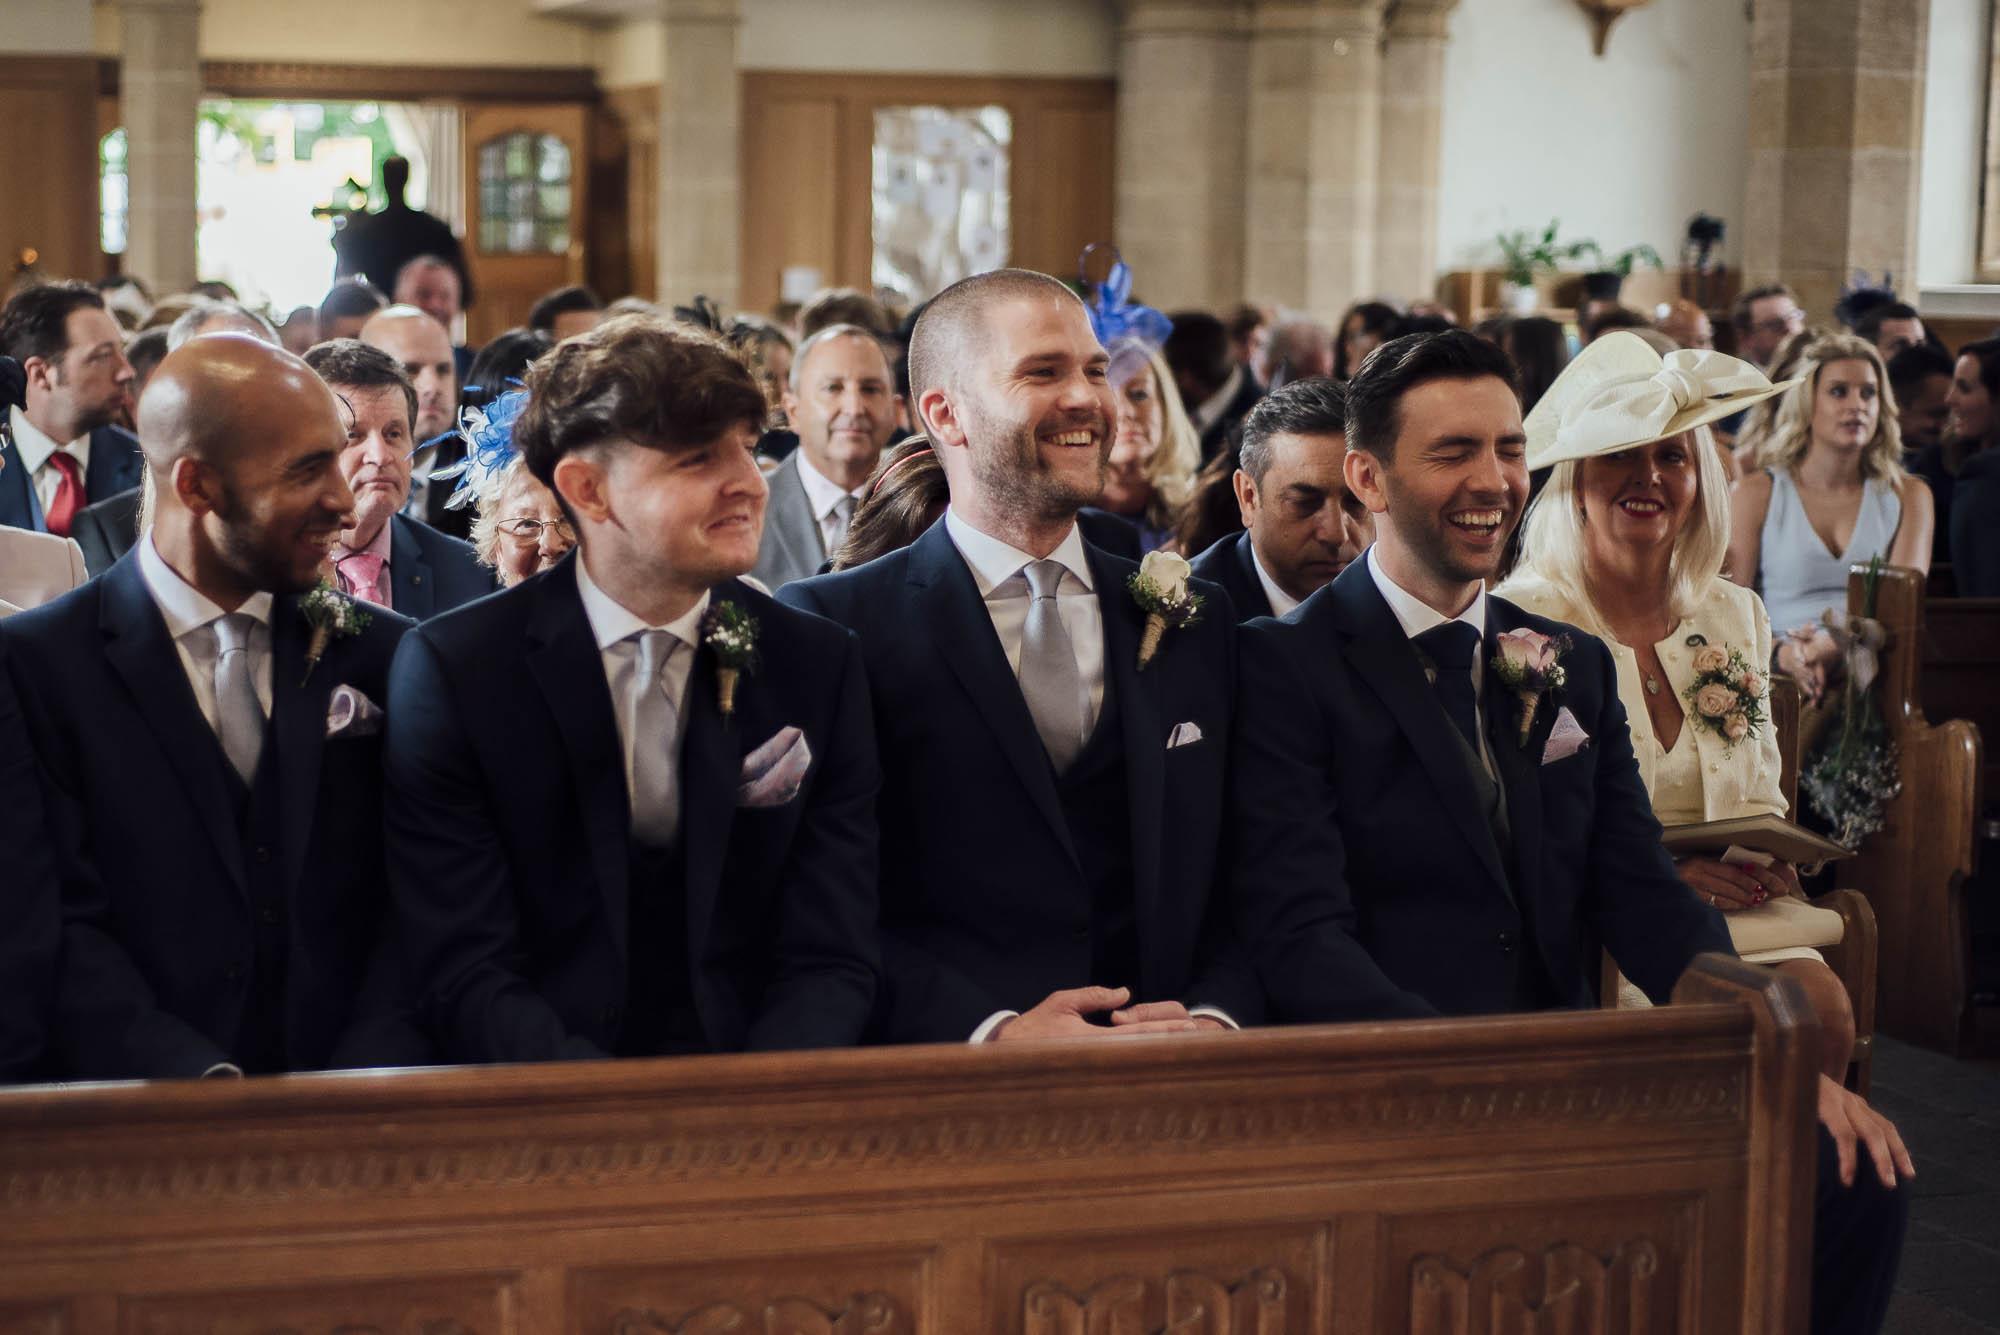 Groom & ushers share a joke at church wedding